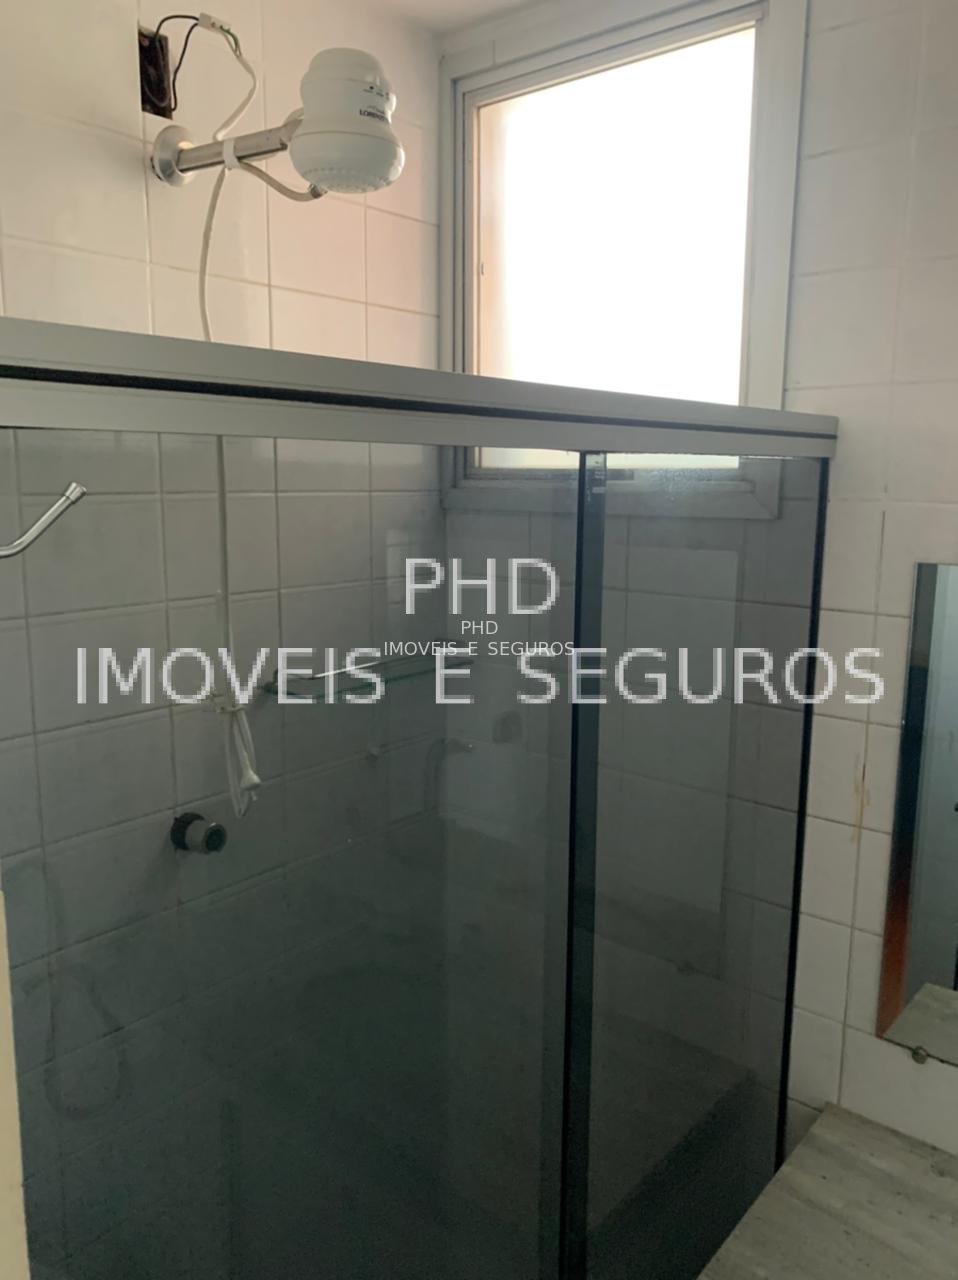 4 - Imóvel de Código PHD730